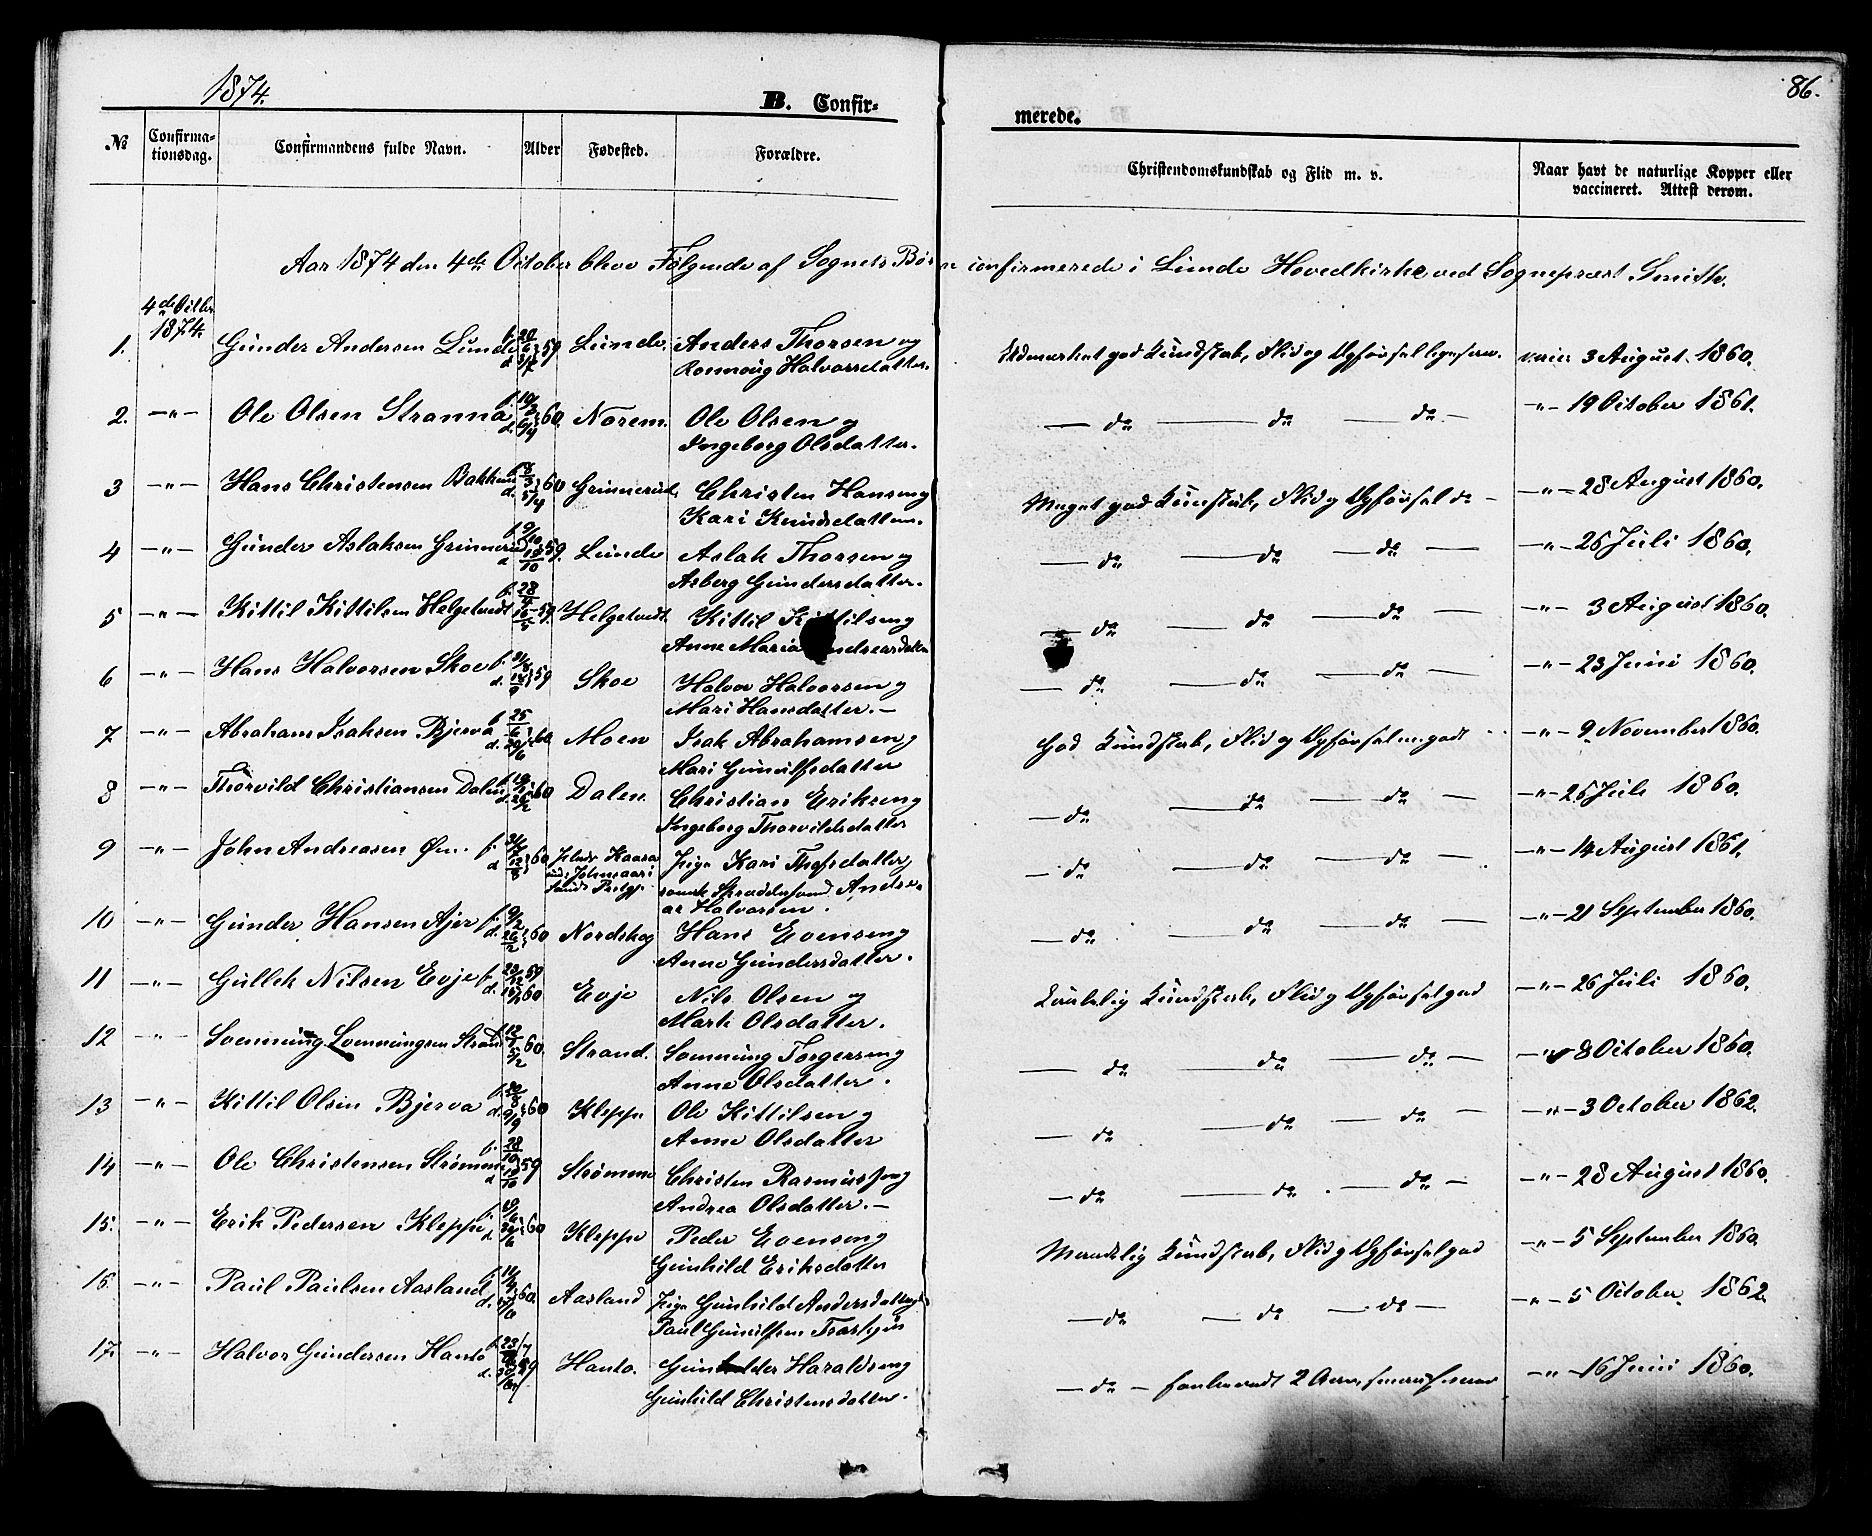 SAKO, Lunde kirkebøker, F/Fa/L0001: Ministerialbok nr. I 1, 1866-1883, s. 86